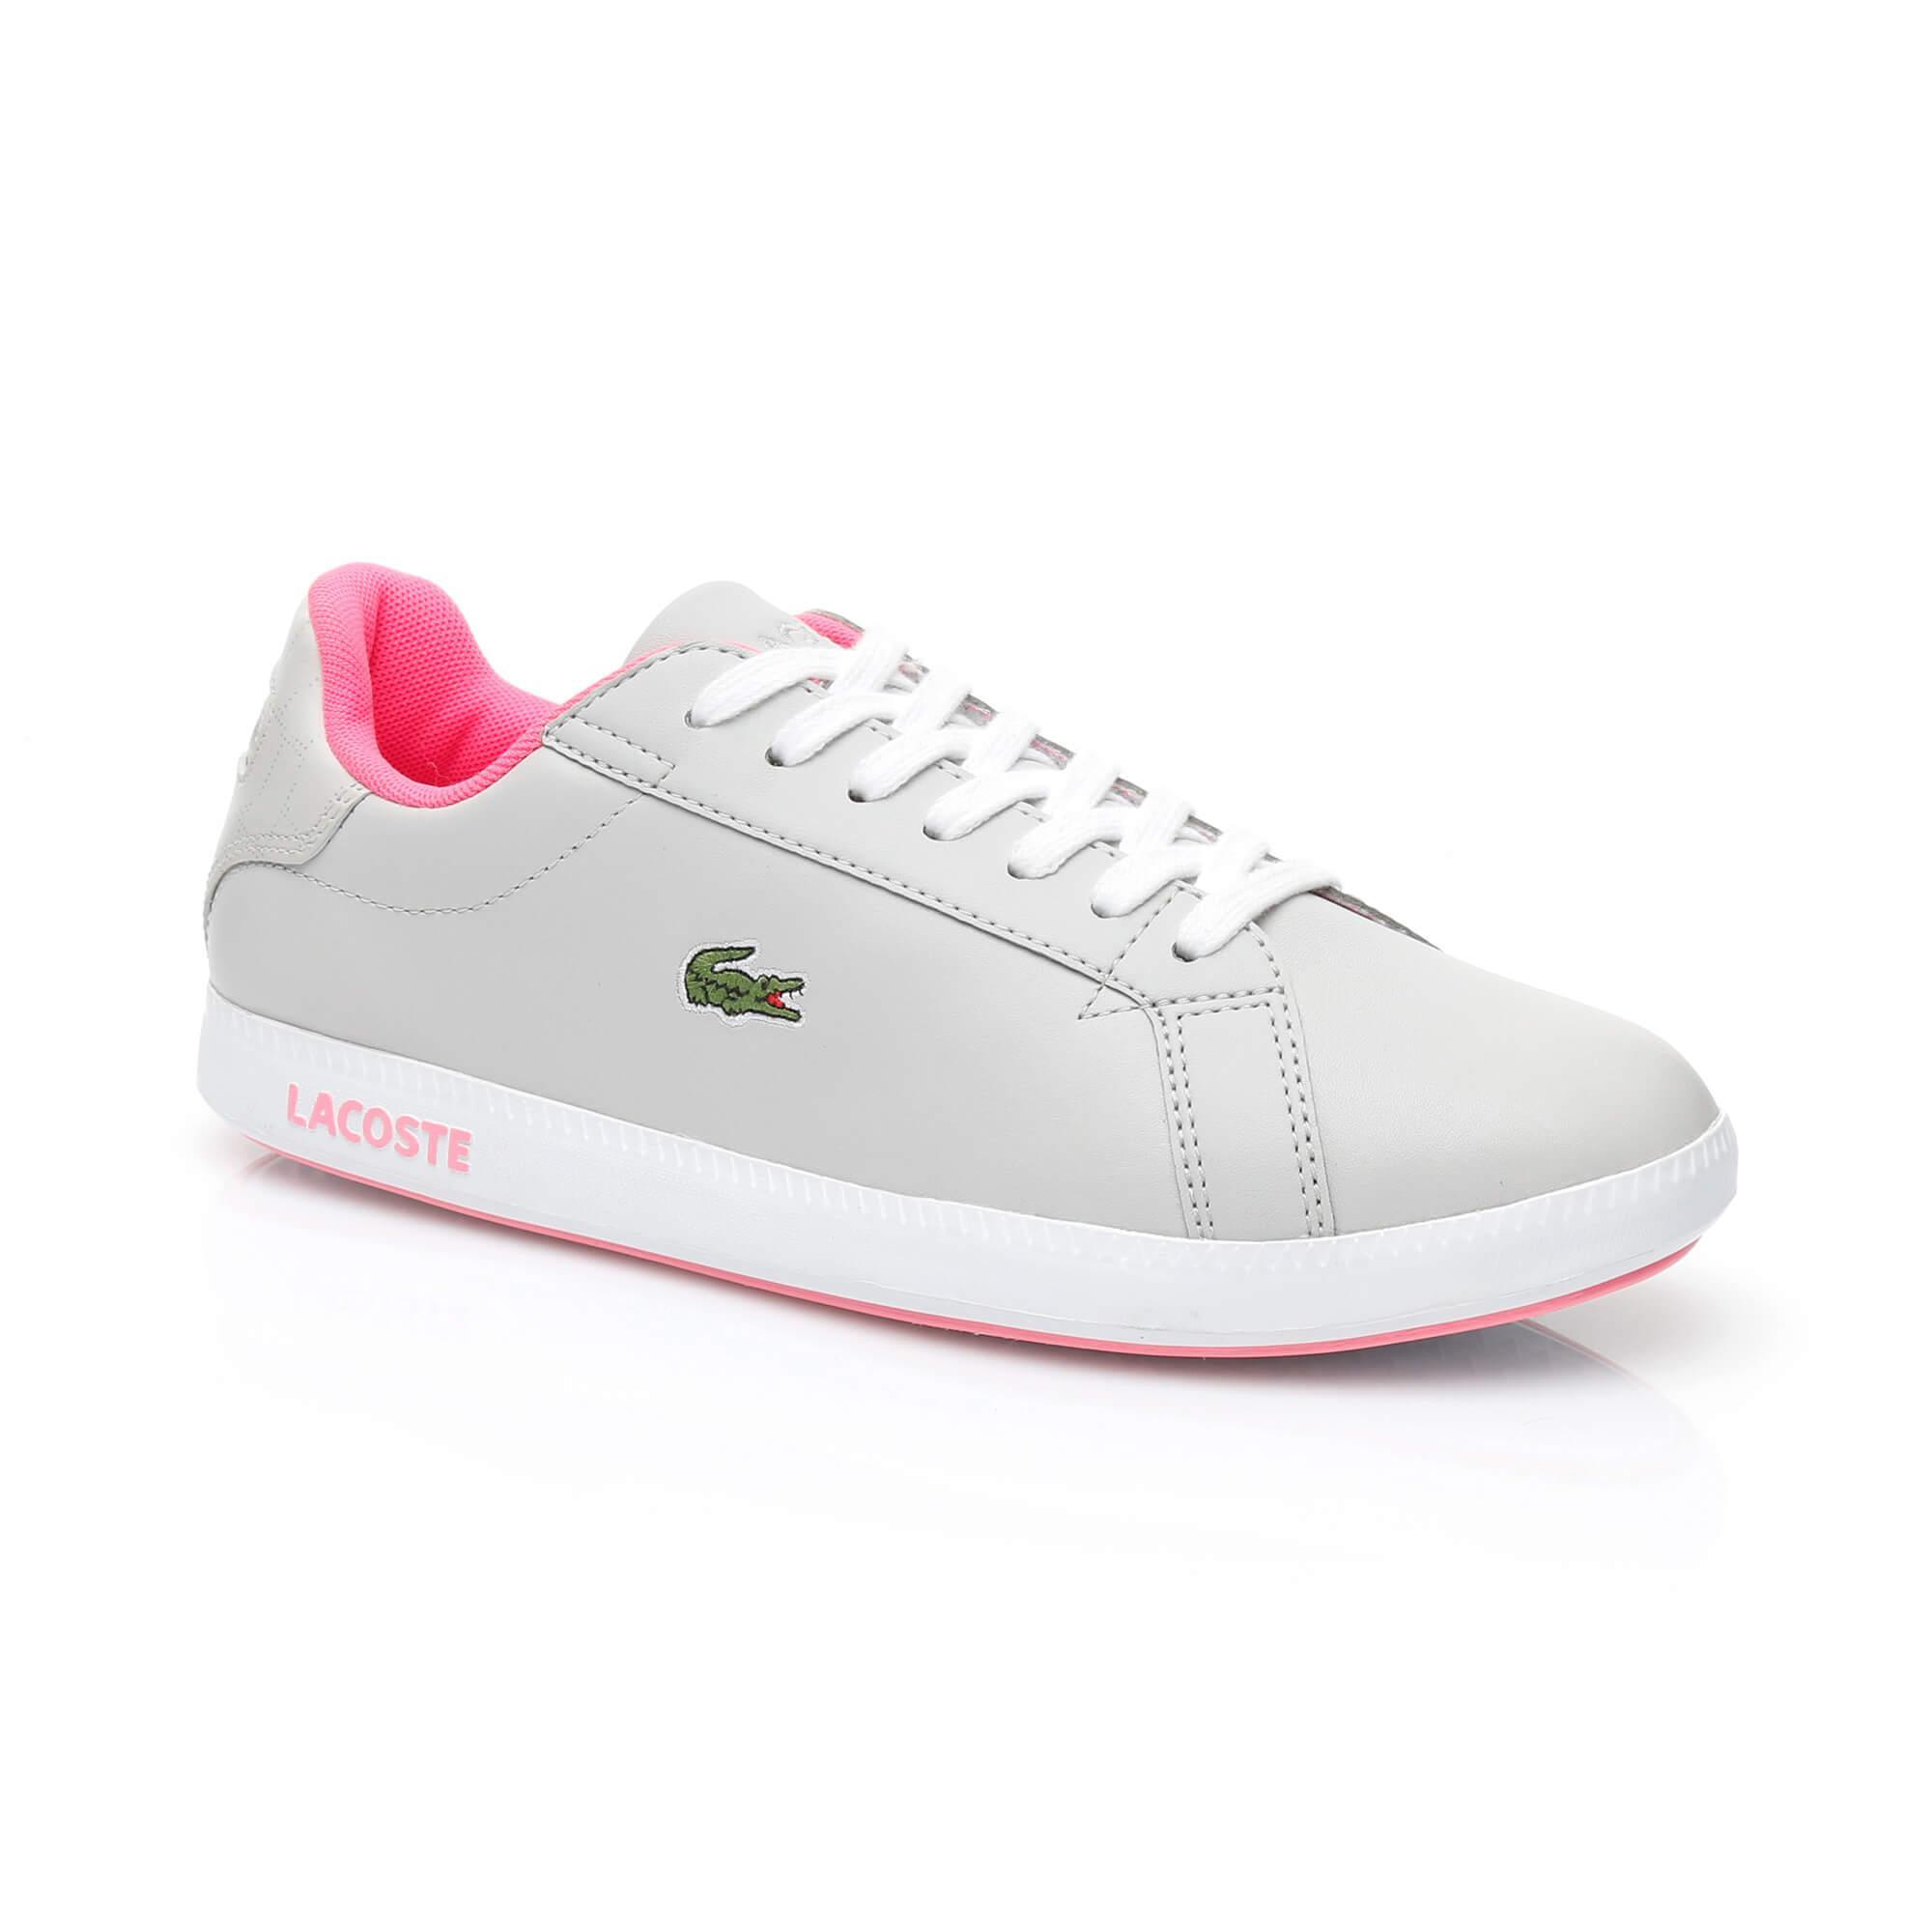 Lacoste Graduate Kadın Sneaker